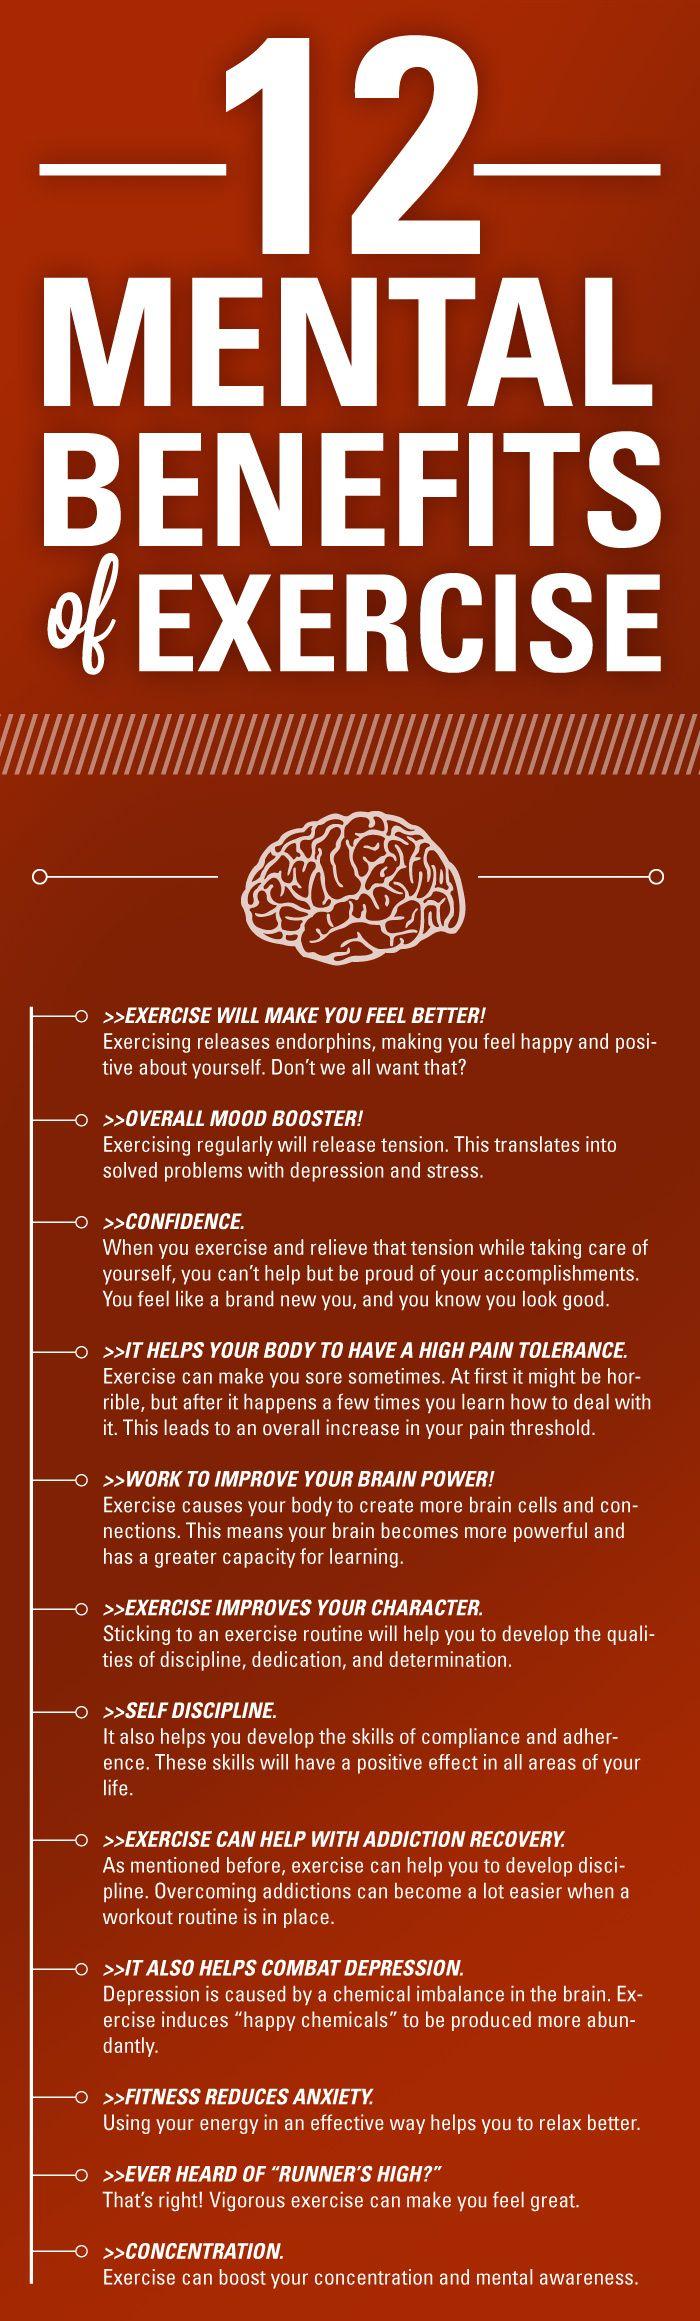 three benefits of exercise essay